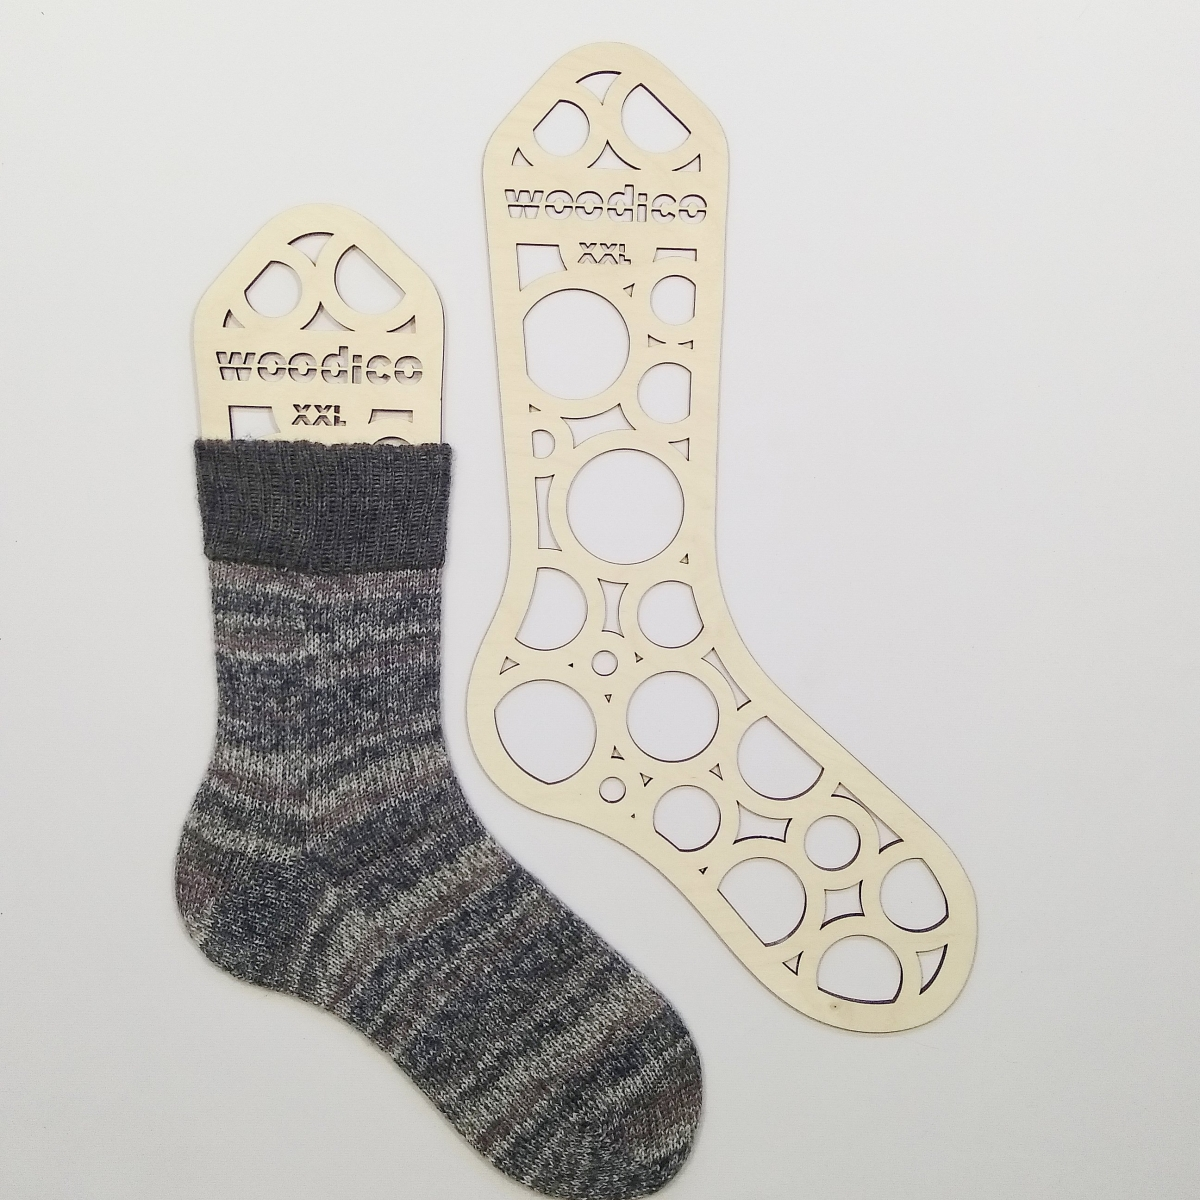 woodico.pro wooden sock blockers circles 9 1200x1200 - Wooden sock blockers / Circles